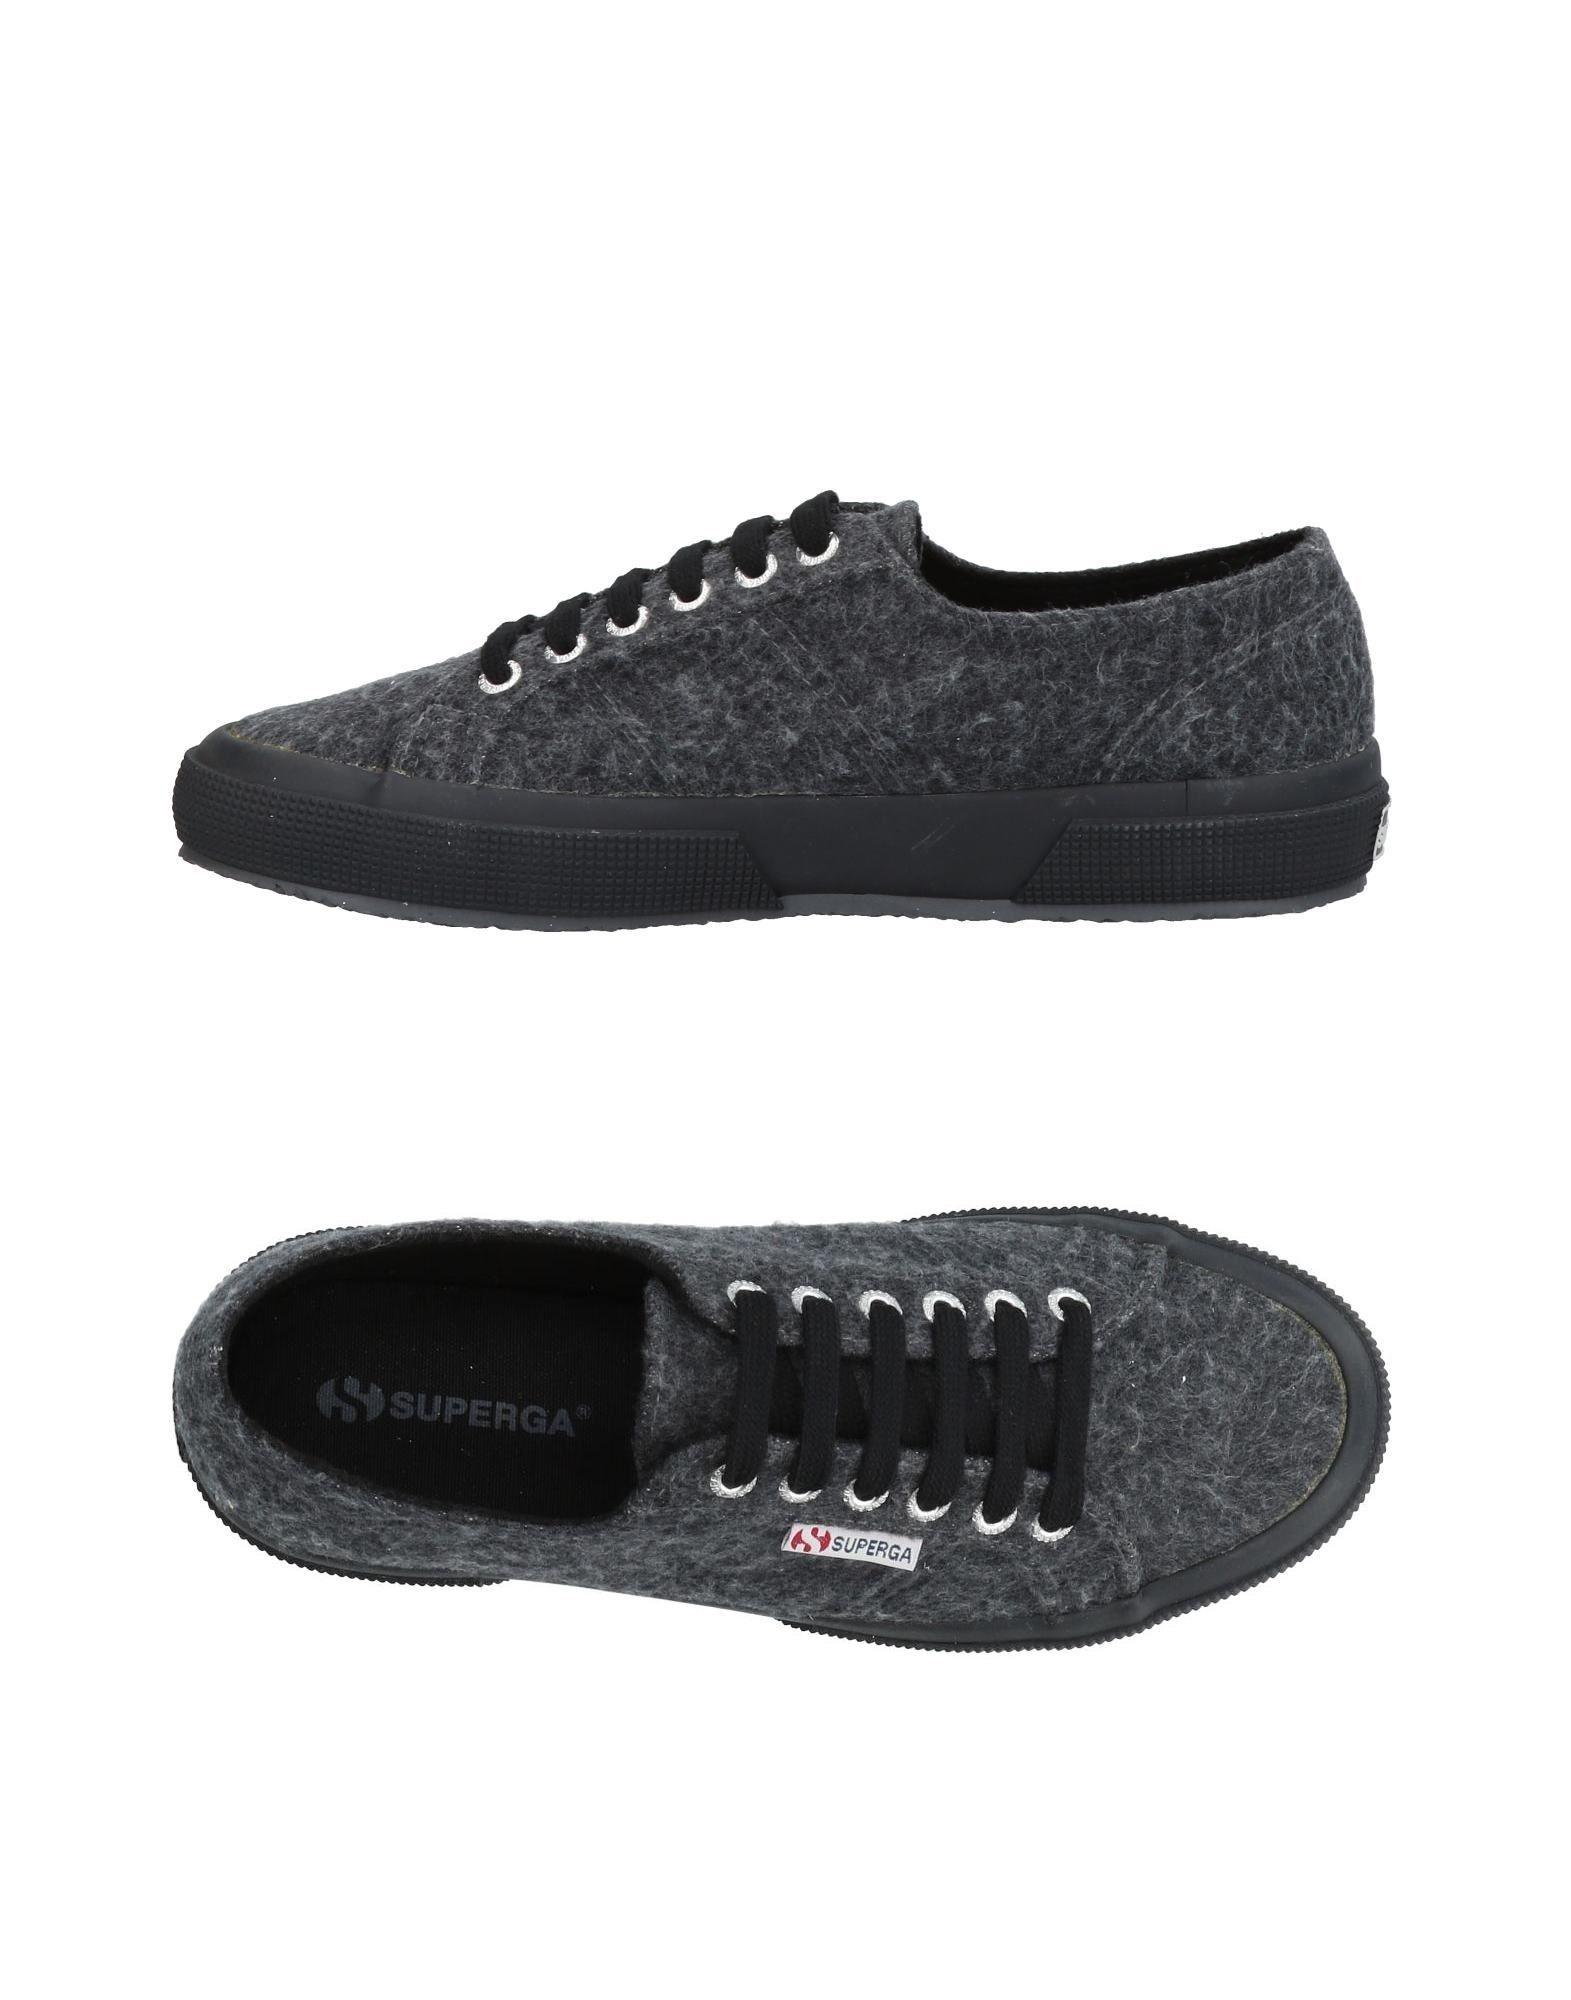 Superga® Superga® Superga® Sneakers Damen Gutes Preis-Leistungs-Verhältnis, es lohnt sich a3b1b7